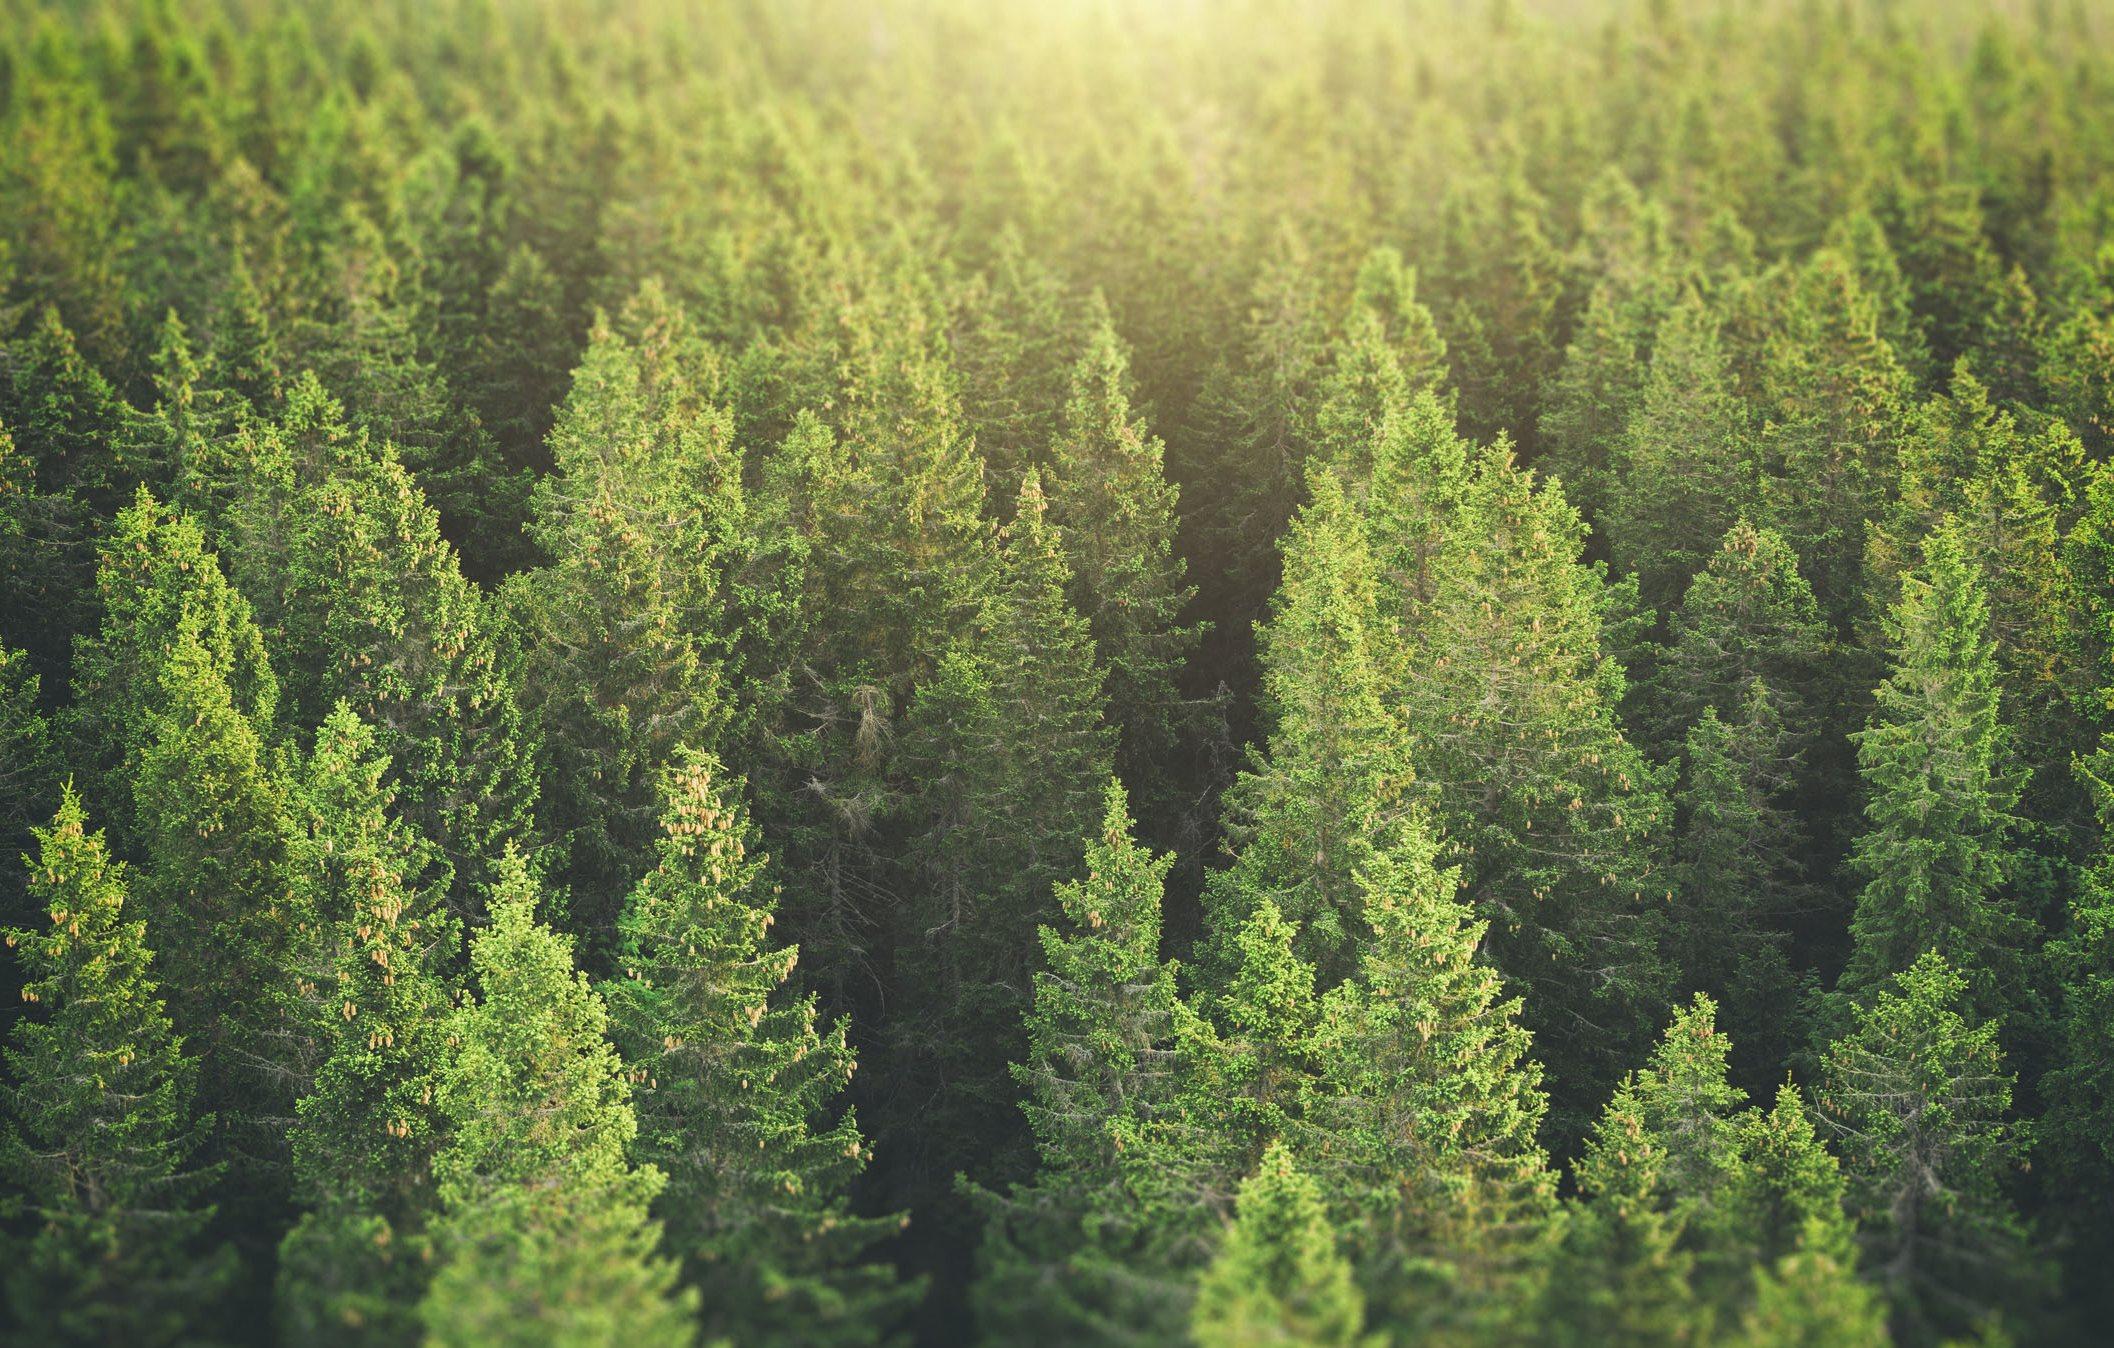 stock image- woods